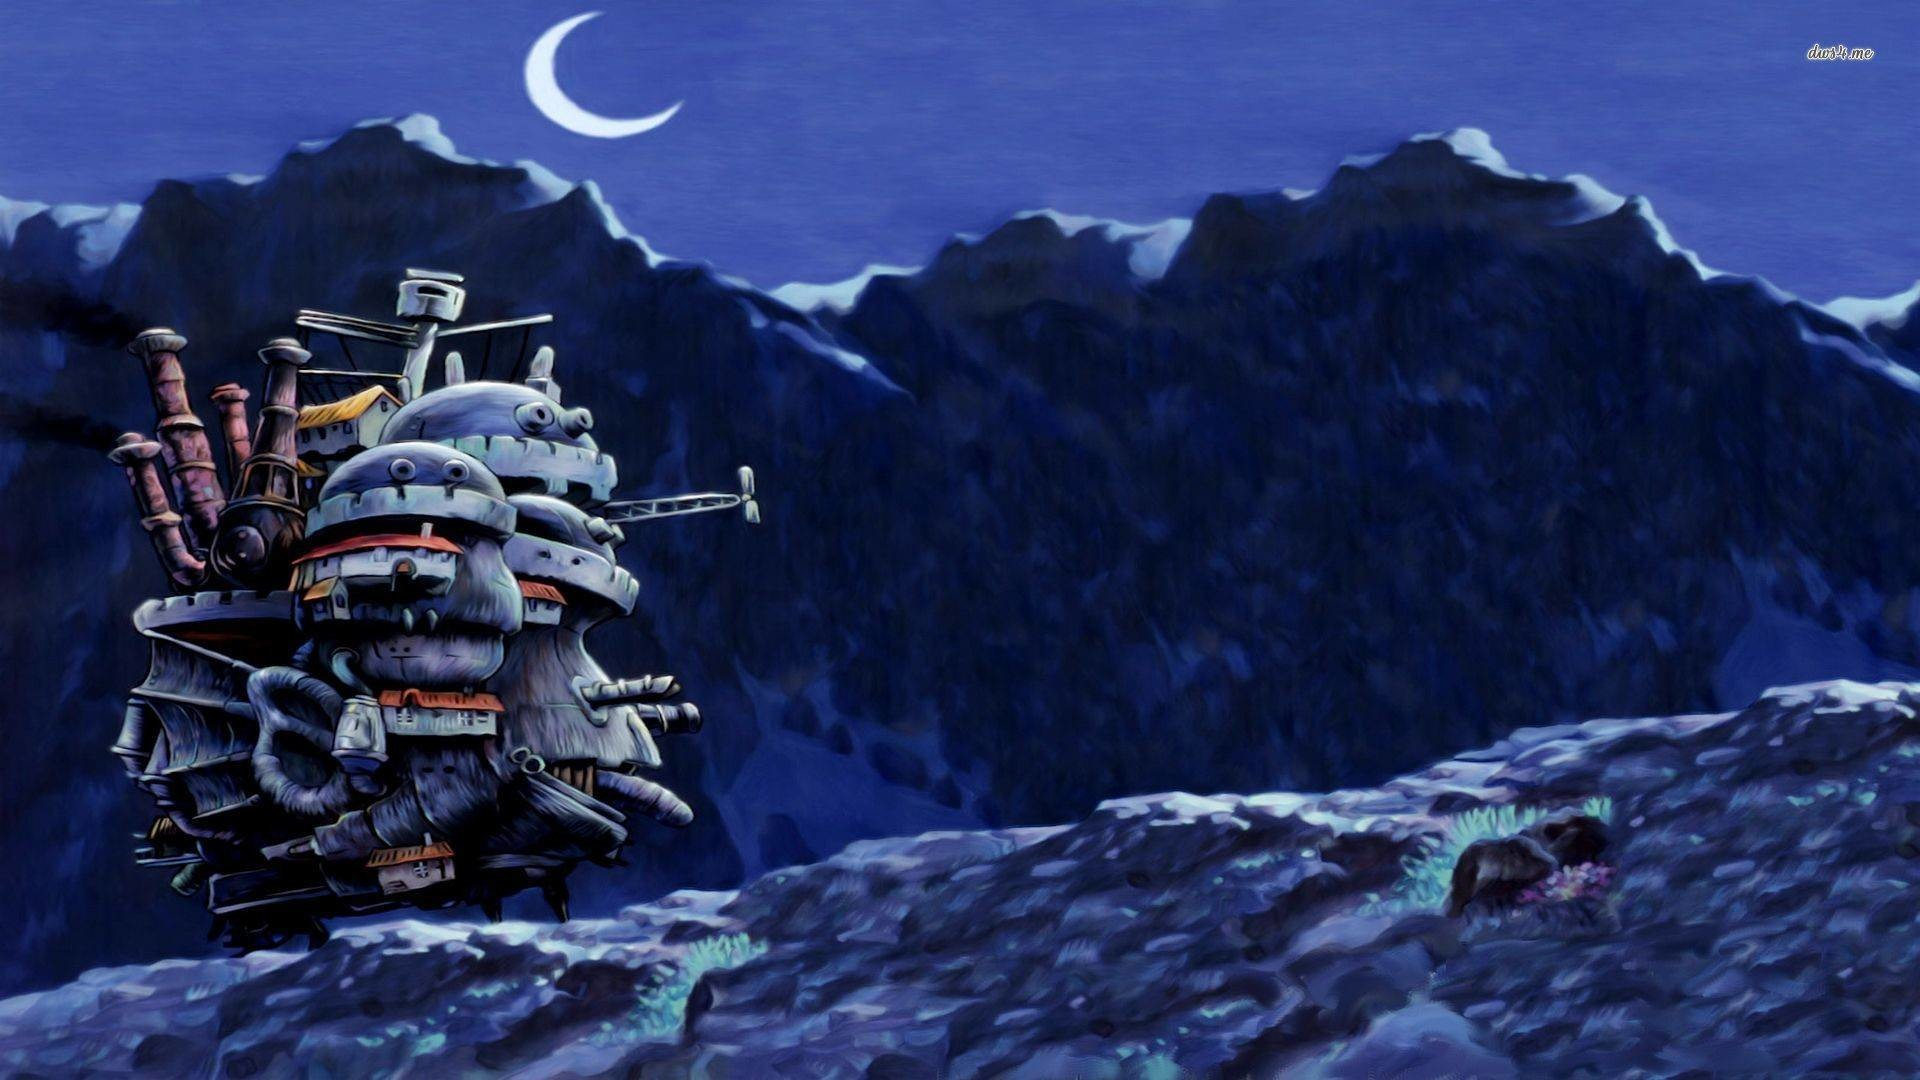 Howl's Moving Castle – Studio Ghibli Wallpaper